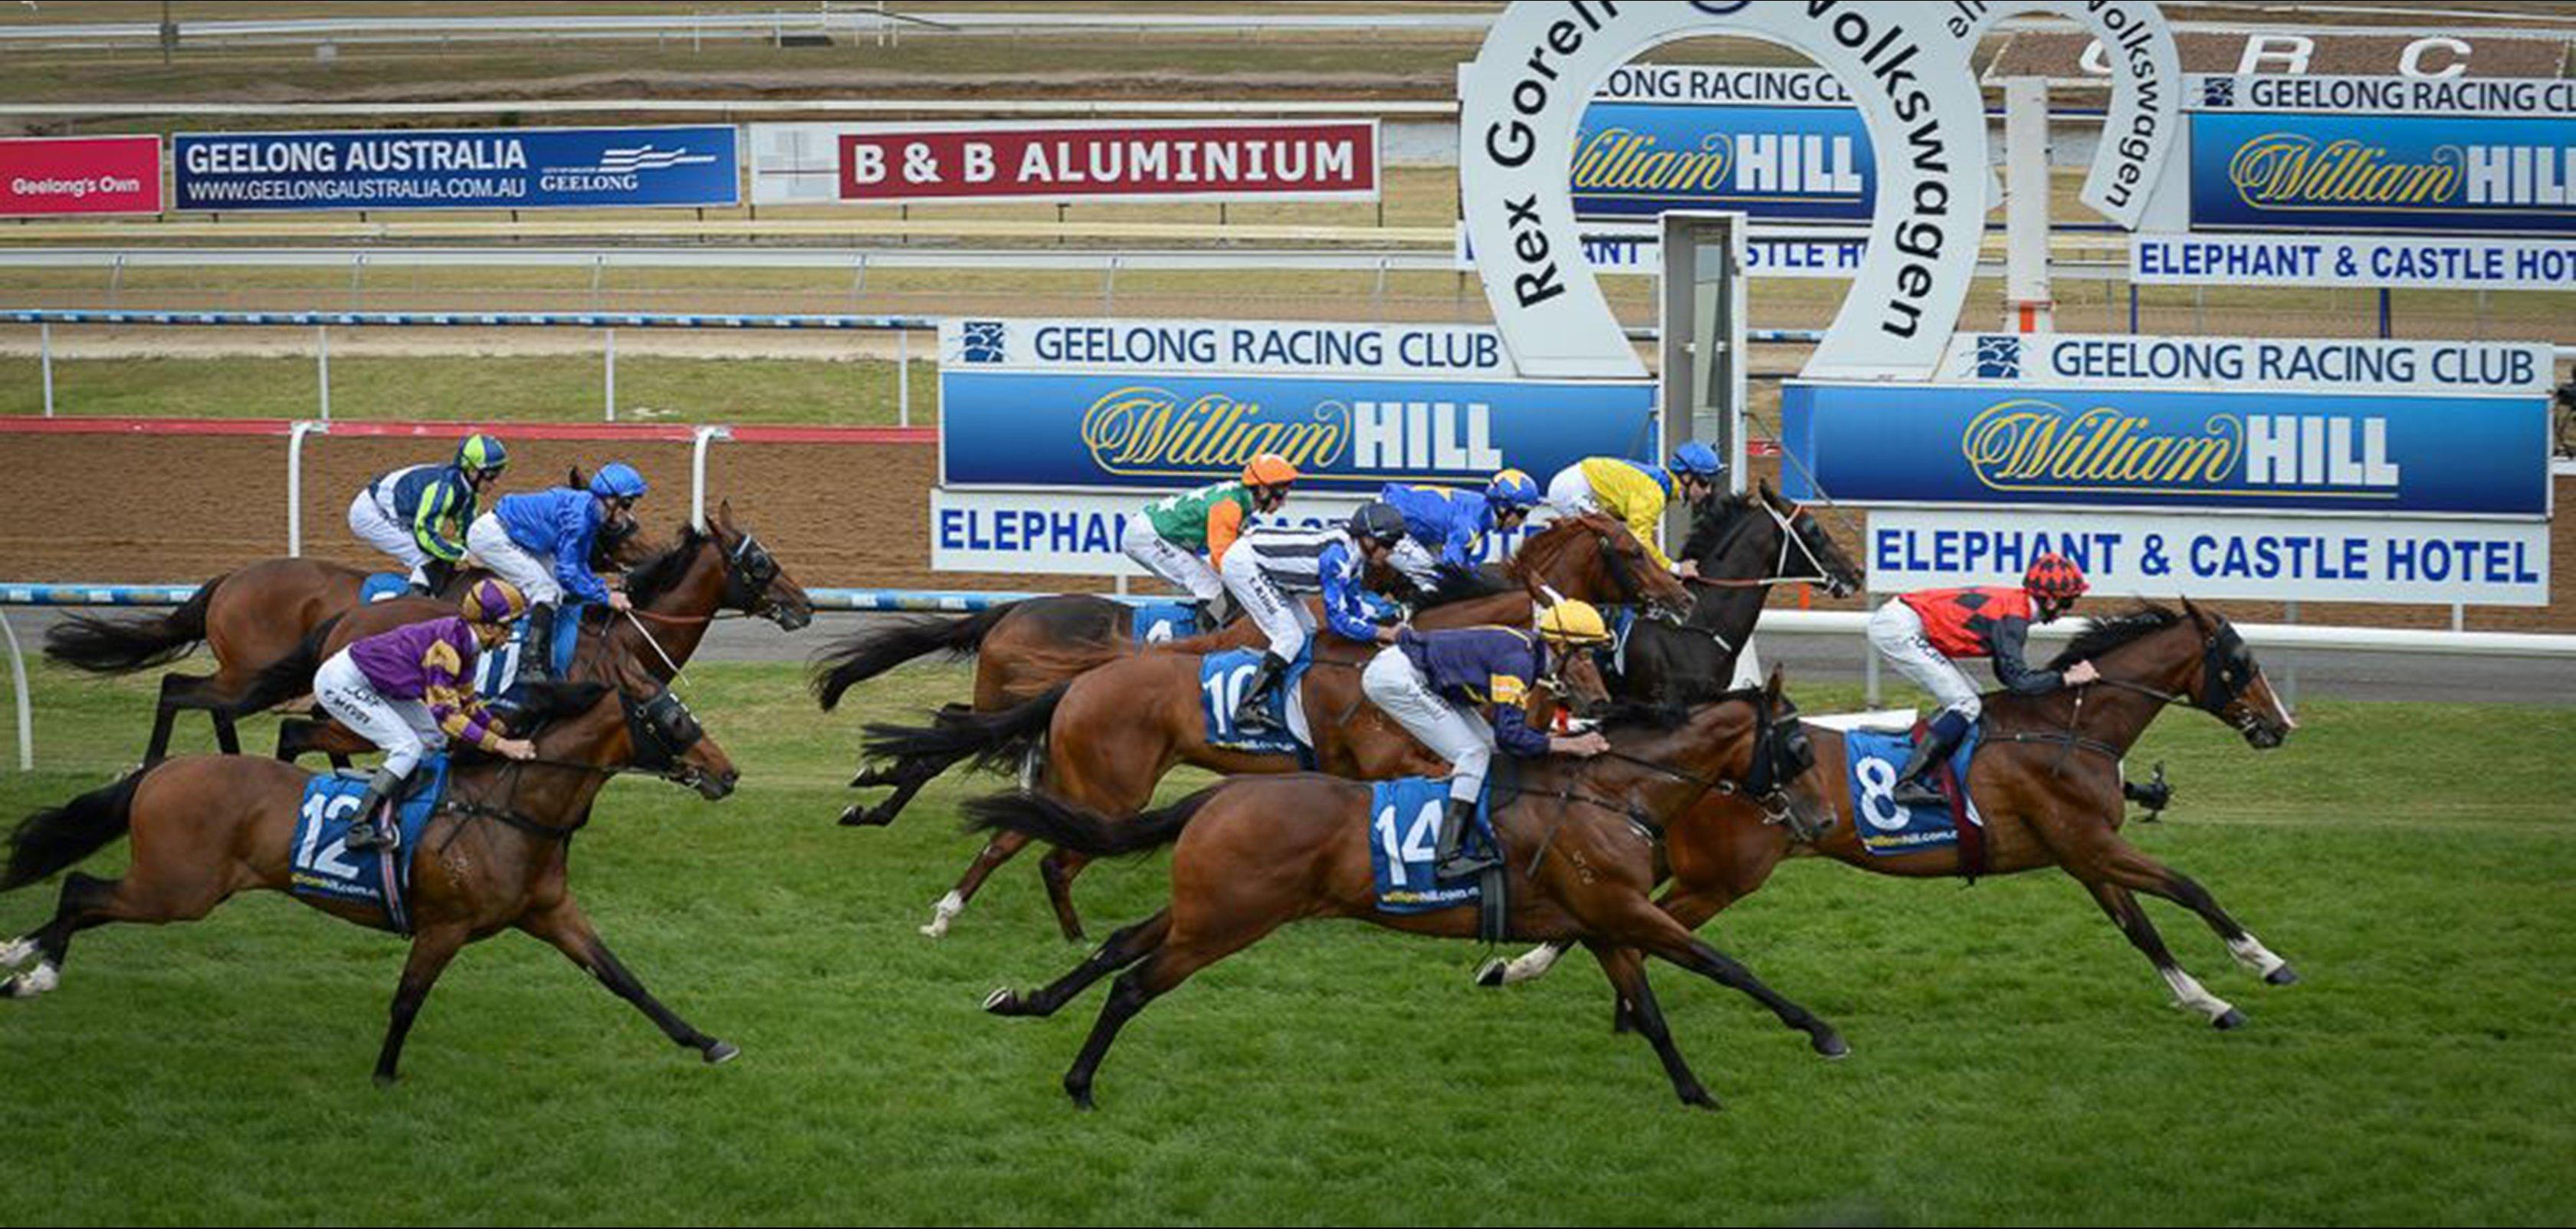 Geelong Race Course